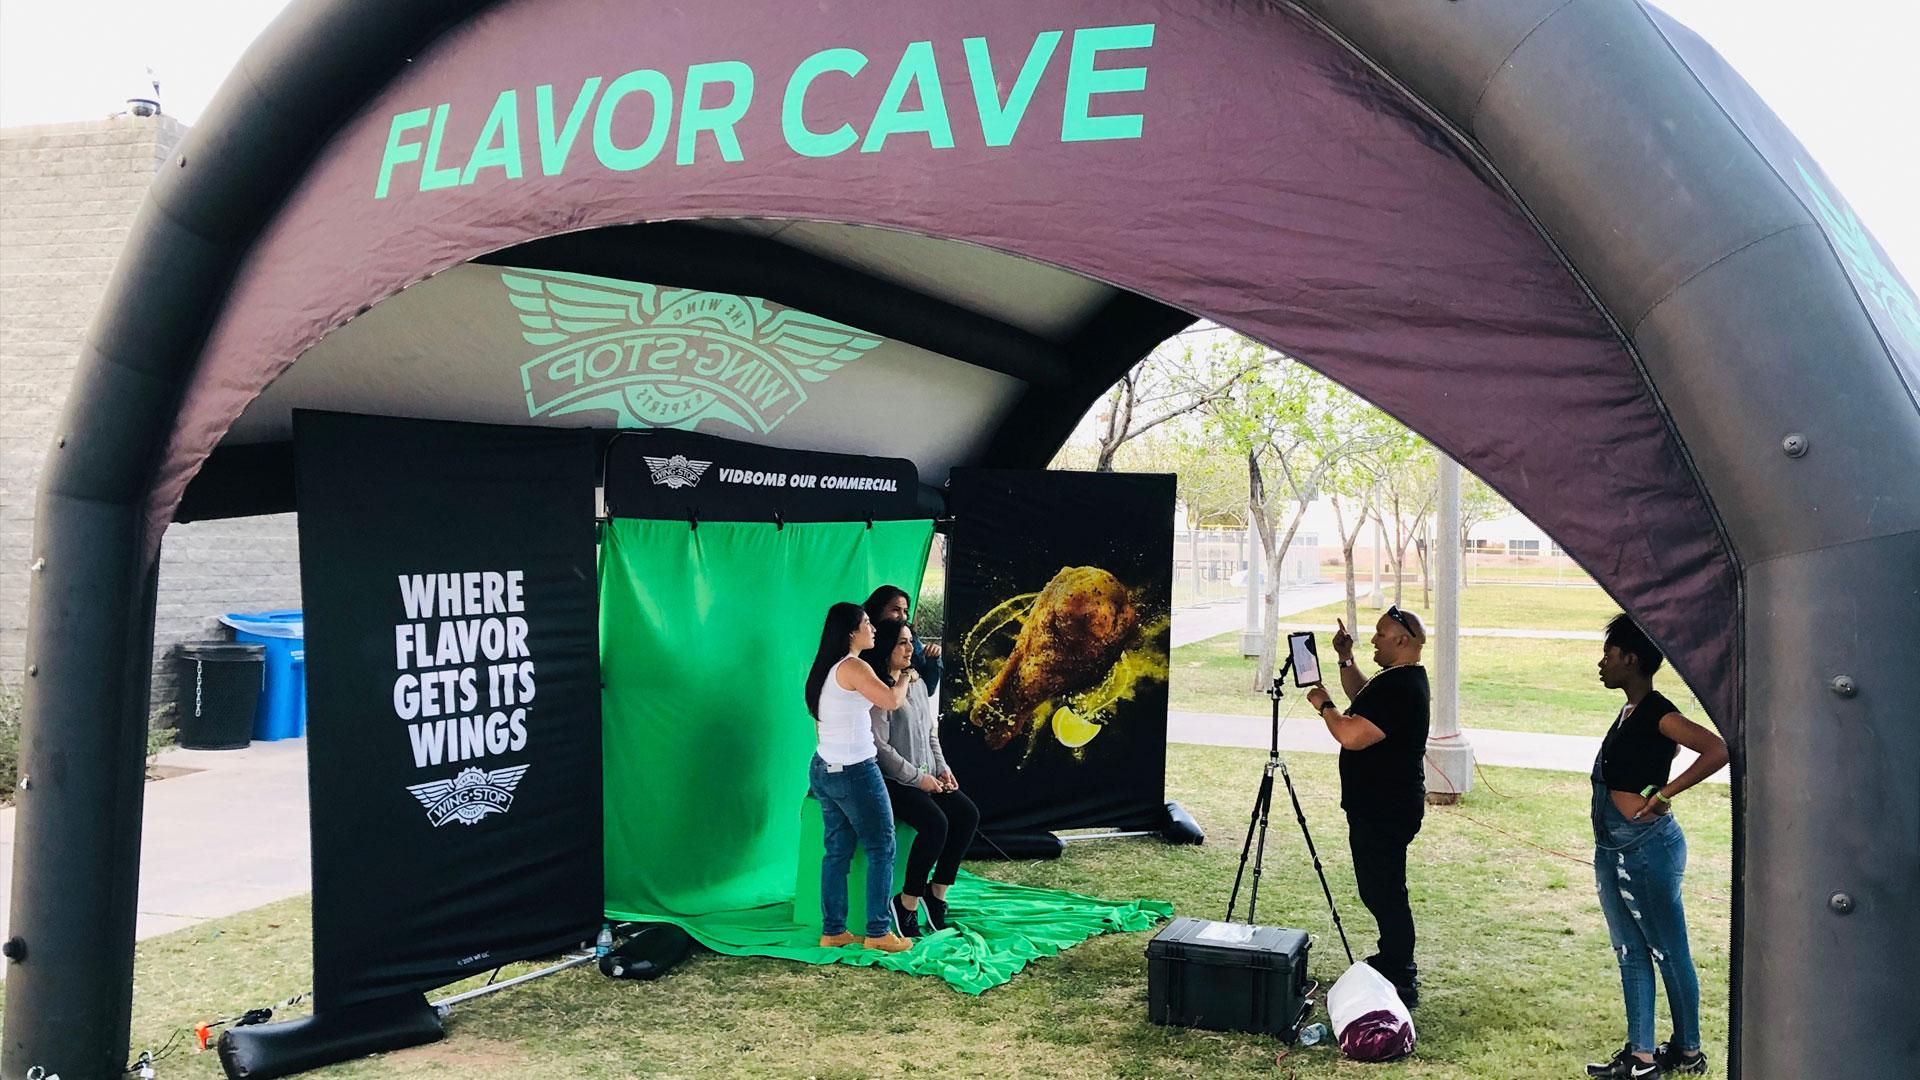 flavor cave